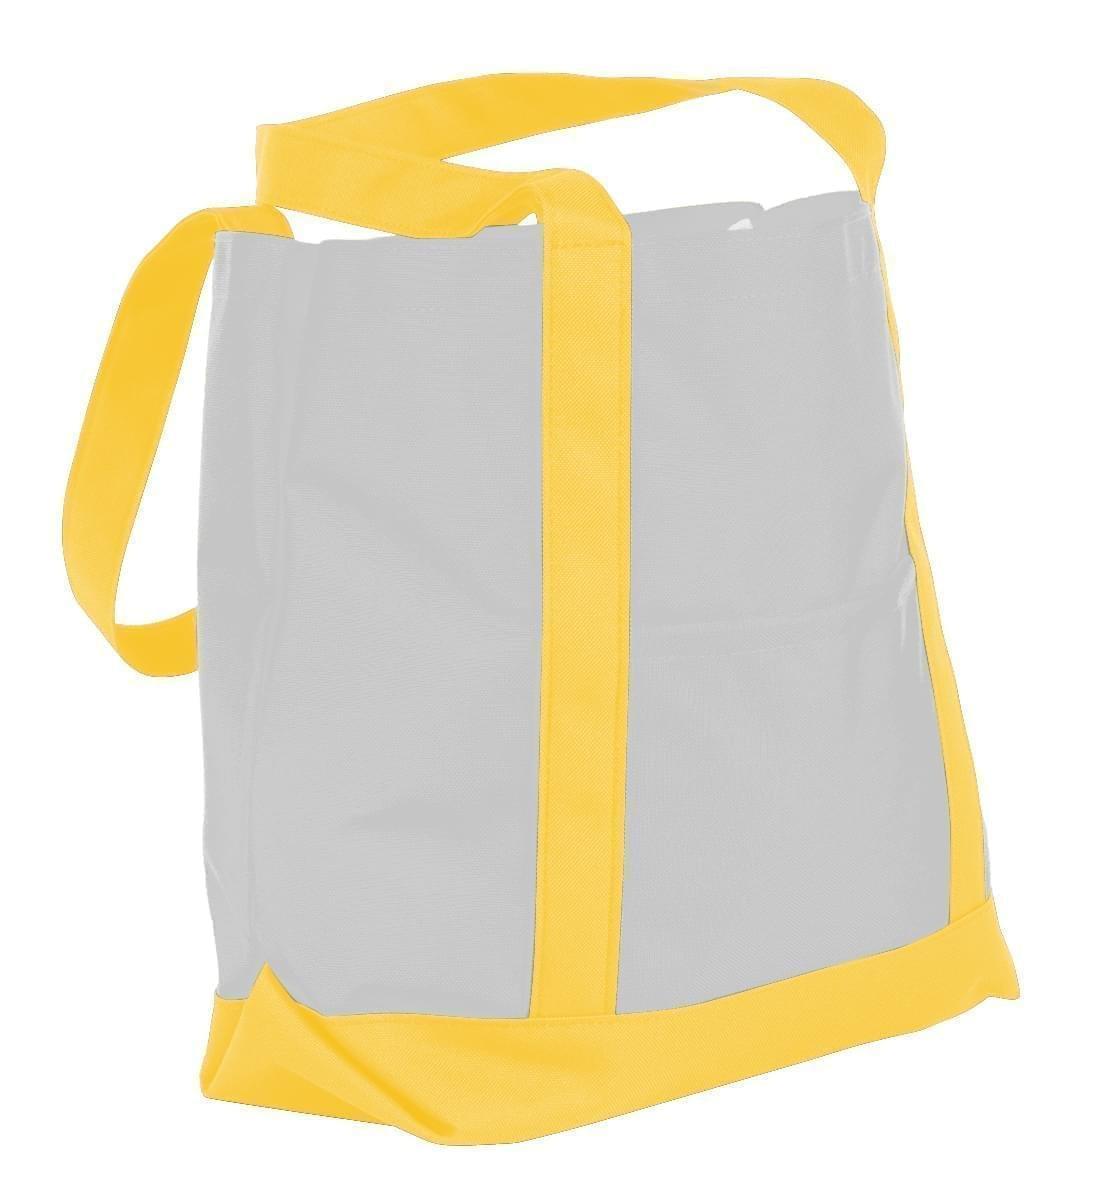 USA Made Nylon Poly Boat Tote Bags, White-Gold, XAACL1UA3Q